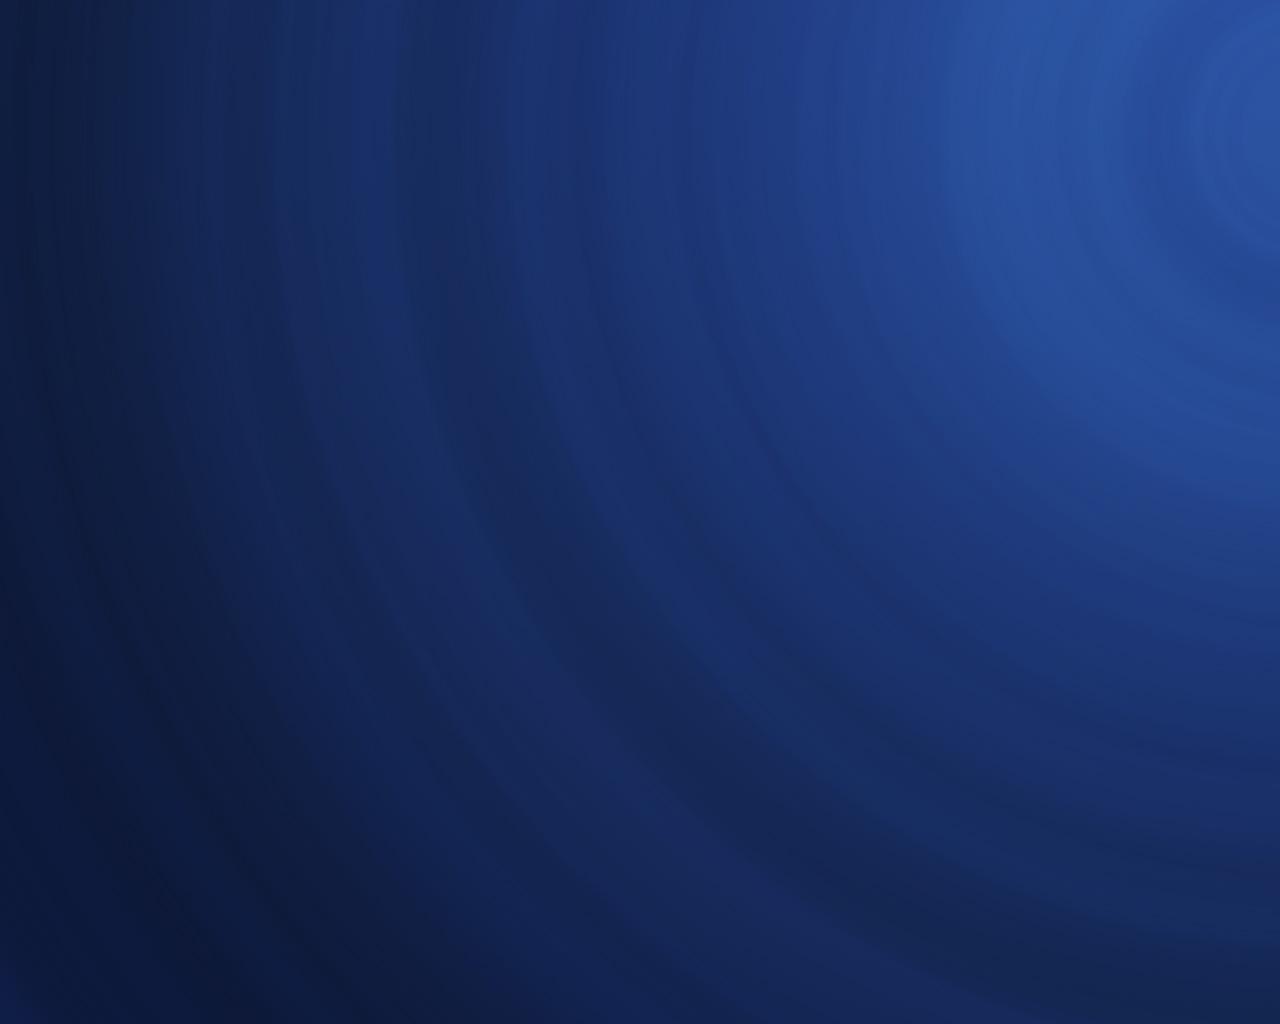 Free Download Wallpaper Plain Blue Backgrounds Hd Wallpaper